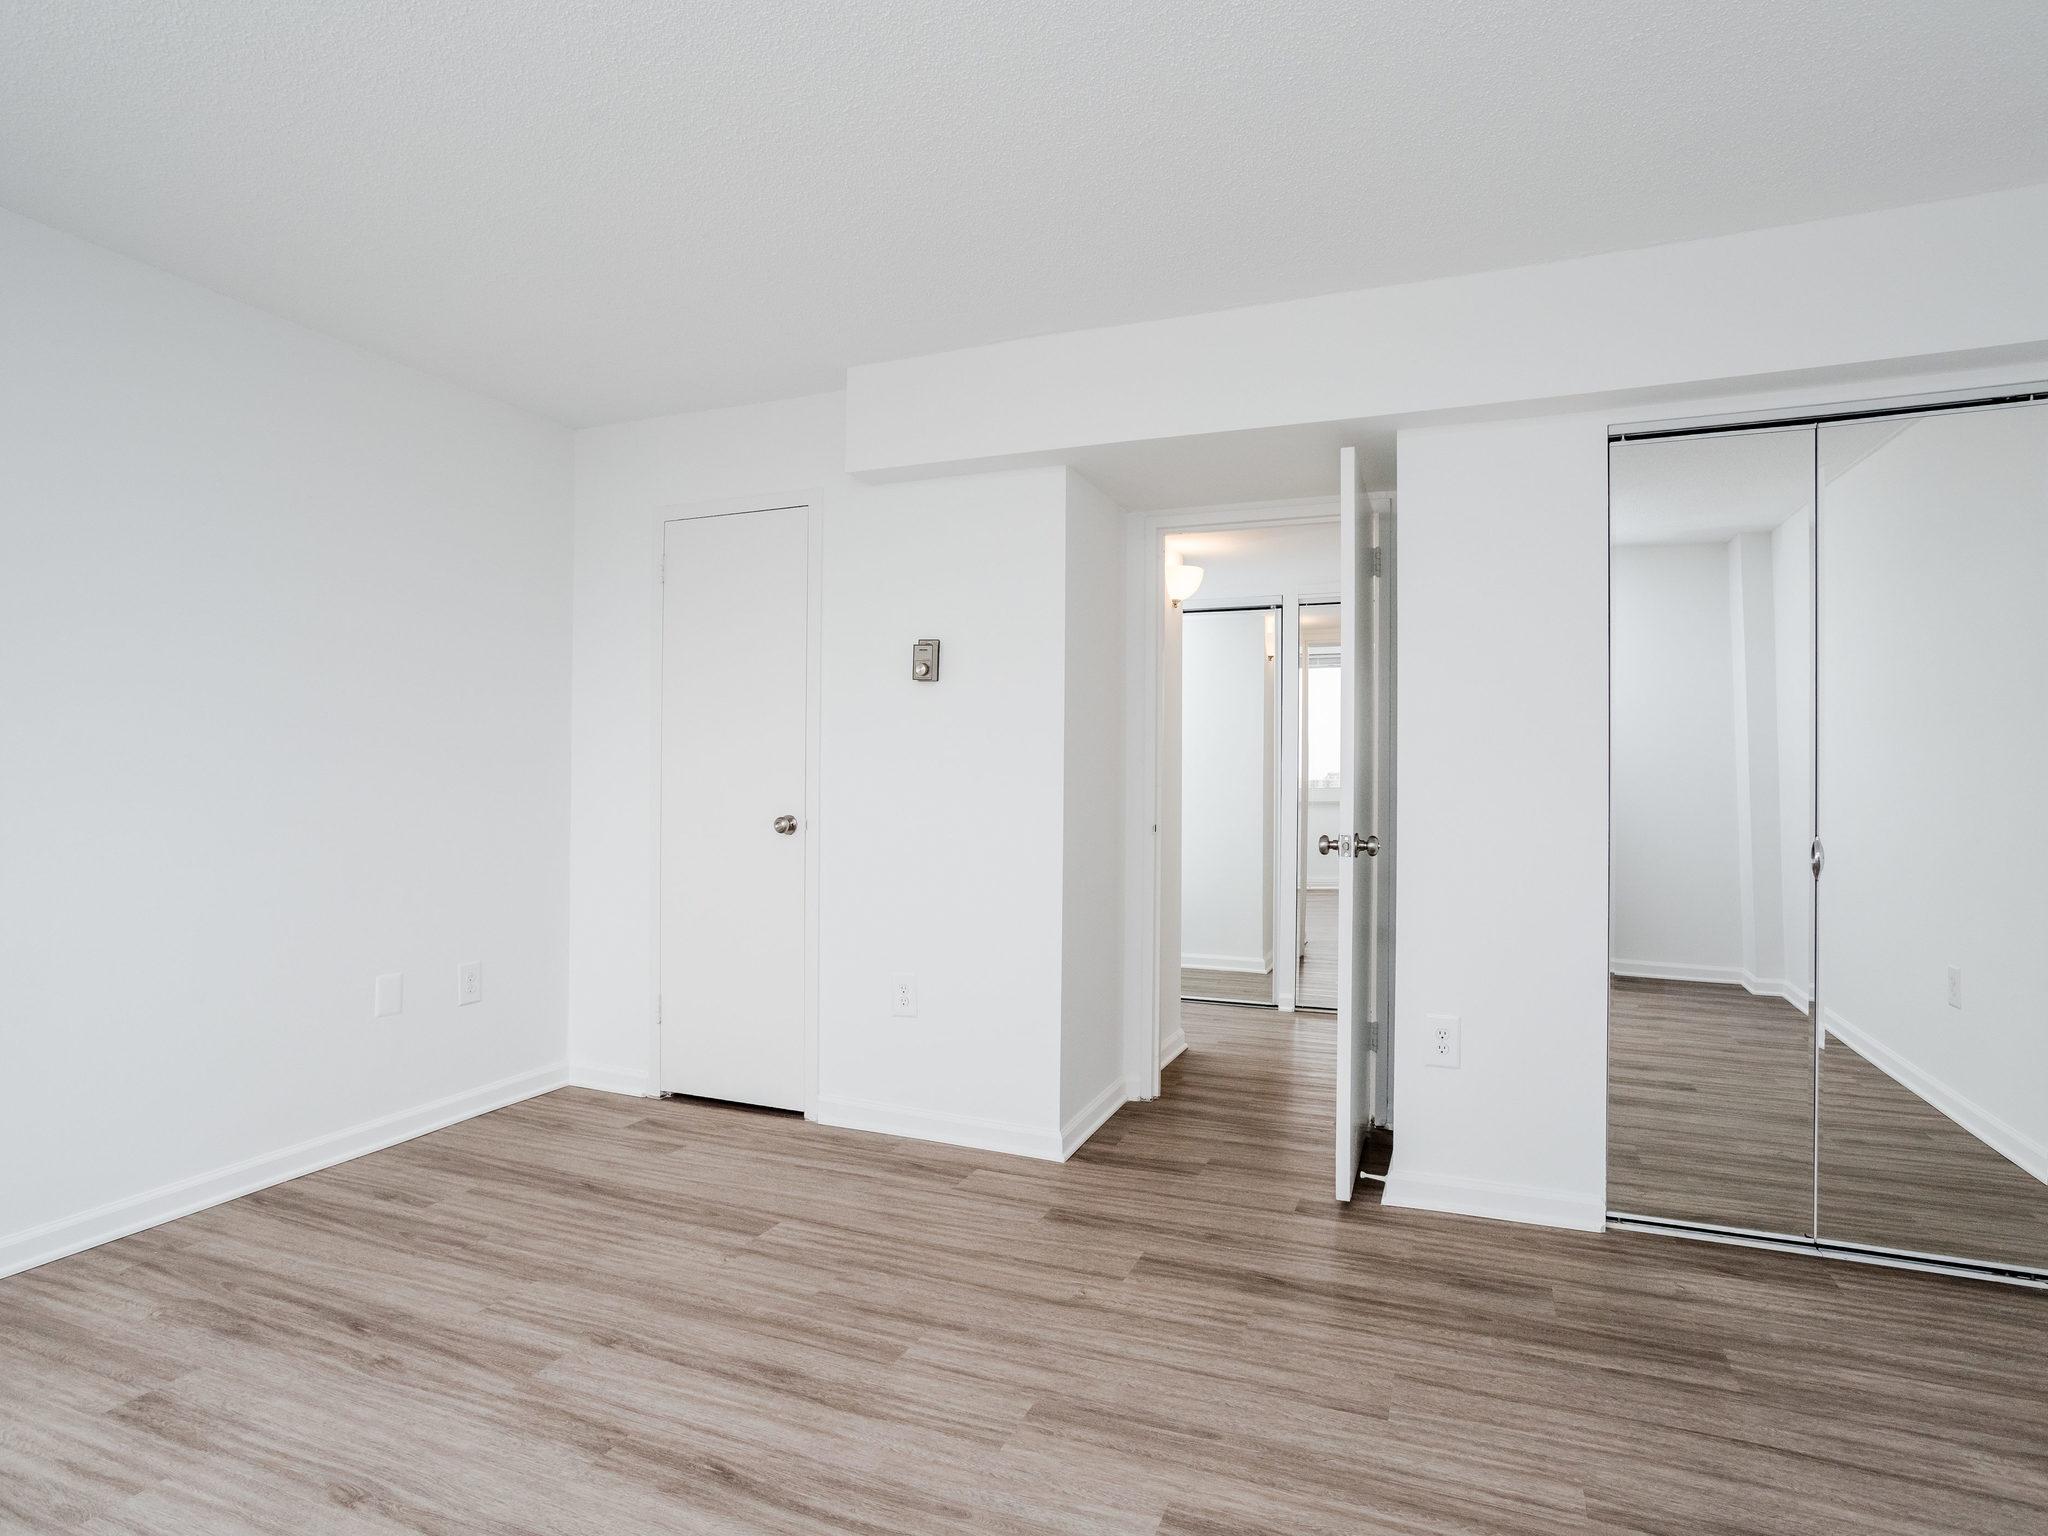 101 S Whiting St 1505-MLS_Size-013-10-Bedroom-2048x1536-72dpi.jpg